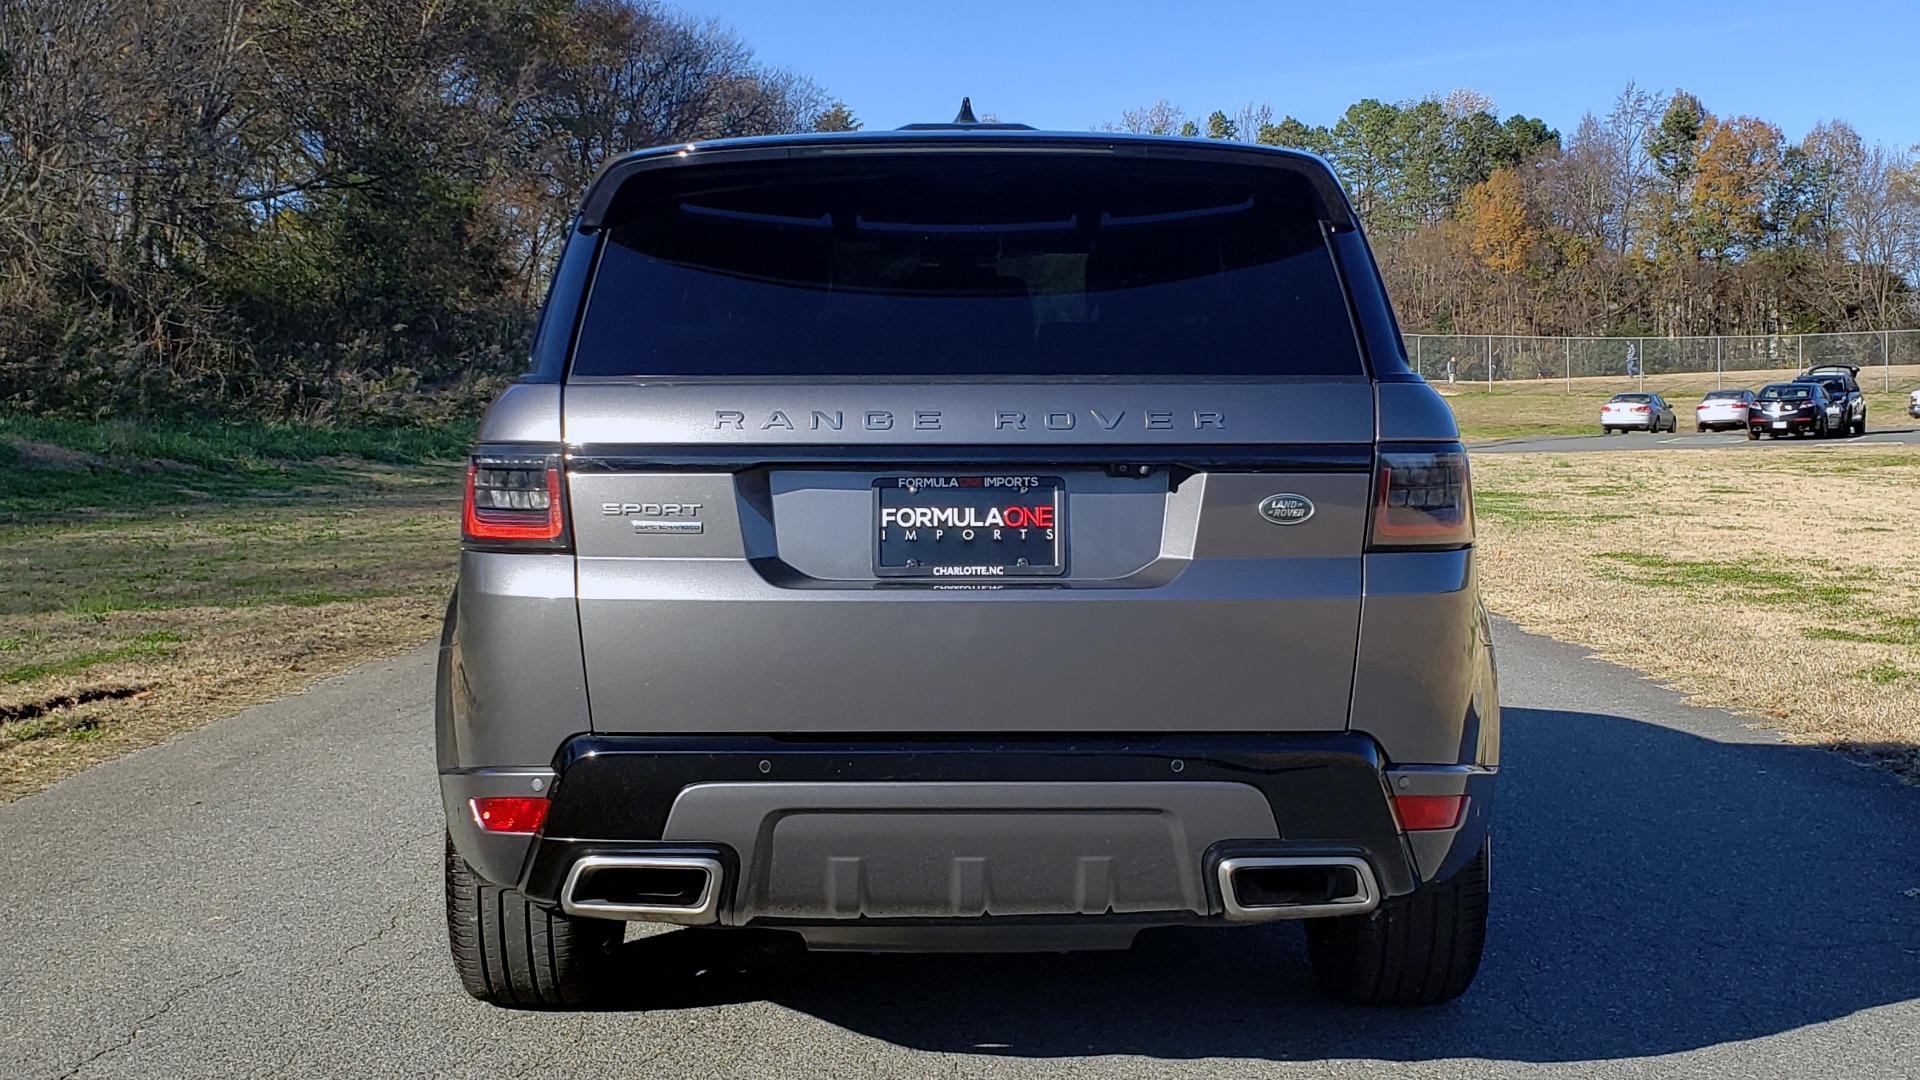 Used 2018 Land Rover RANGE ROVER SPORT DYNAMIC SC V8 / CLIMATE CMFRT / VISION ASST / MERIDIAN for sale Sold at Formula Imports in Charlotte NC 28227 12